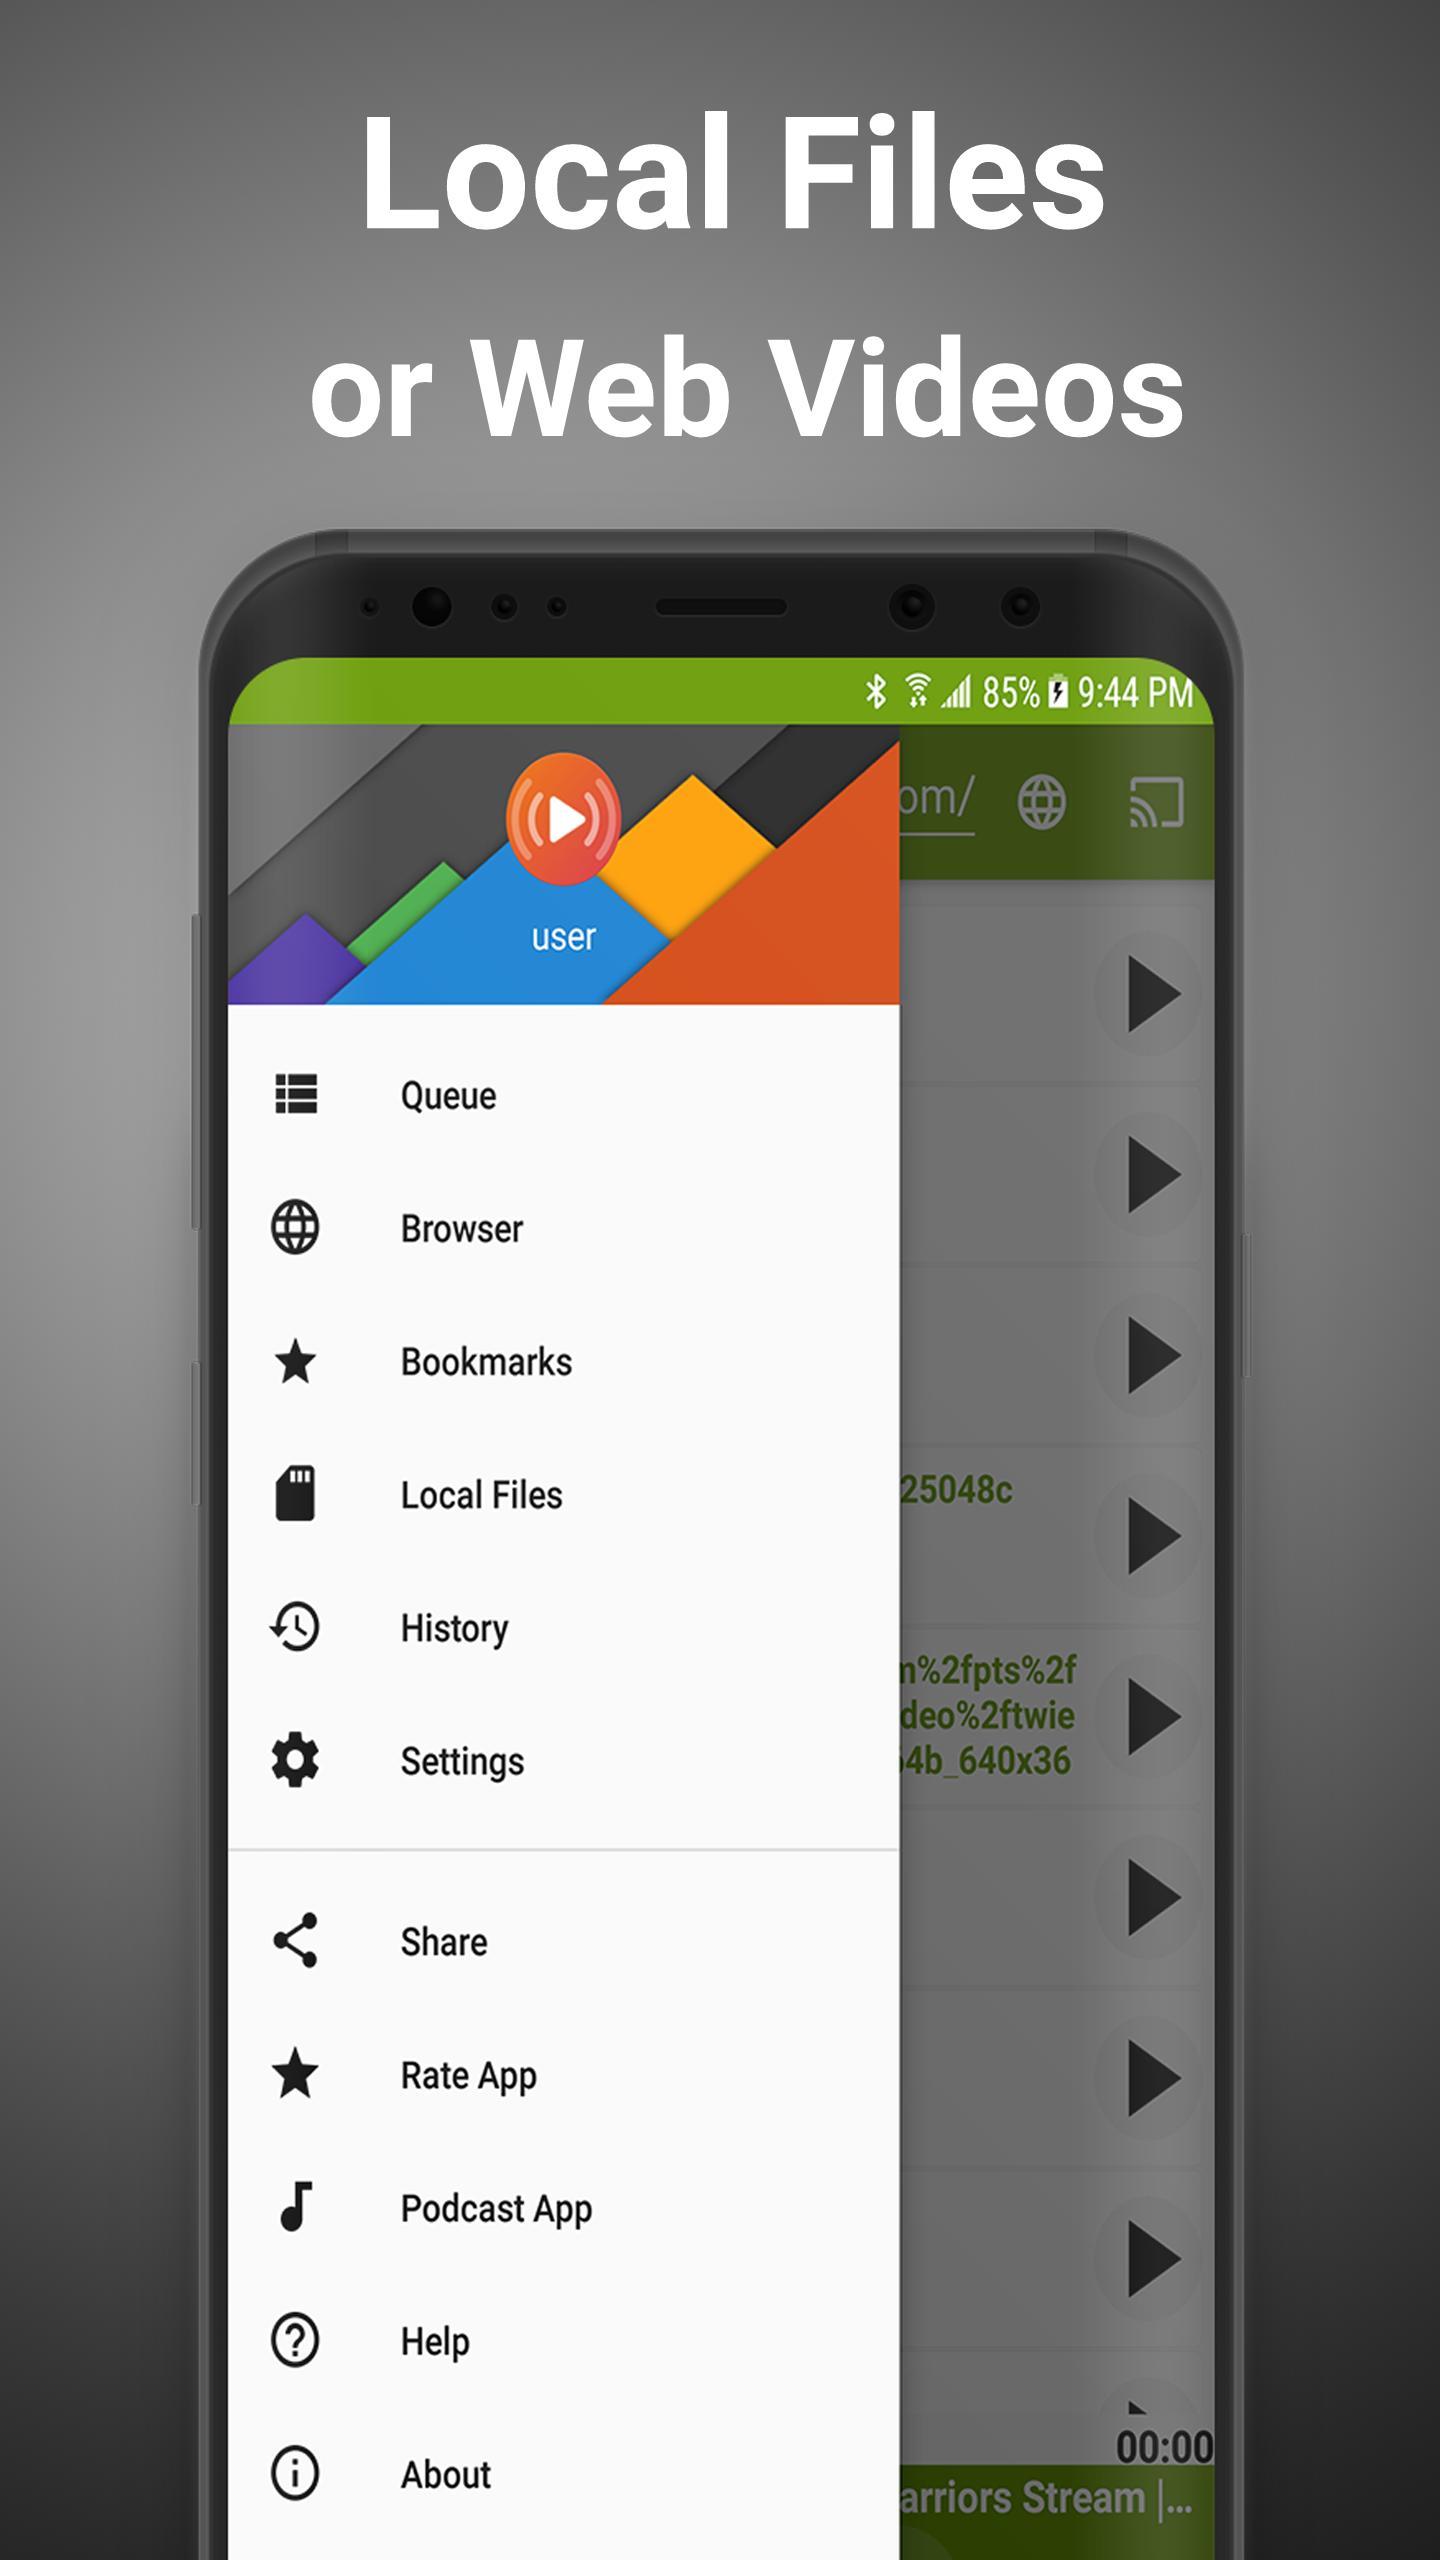 CHROMECAST IPHONE SCREEN - Apple TV vs Google Chromecast